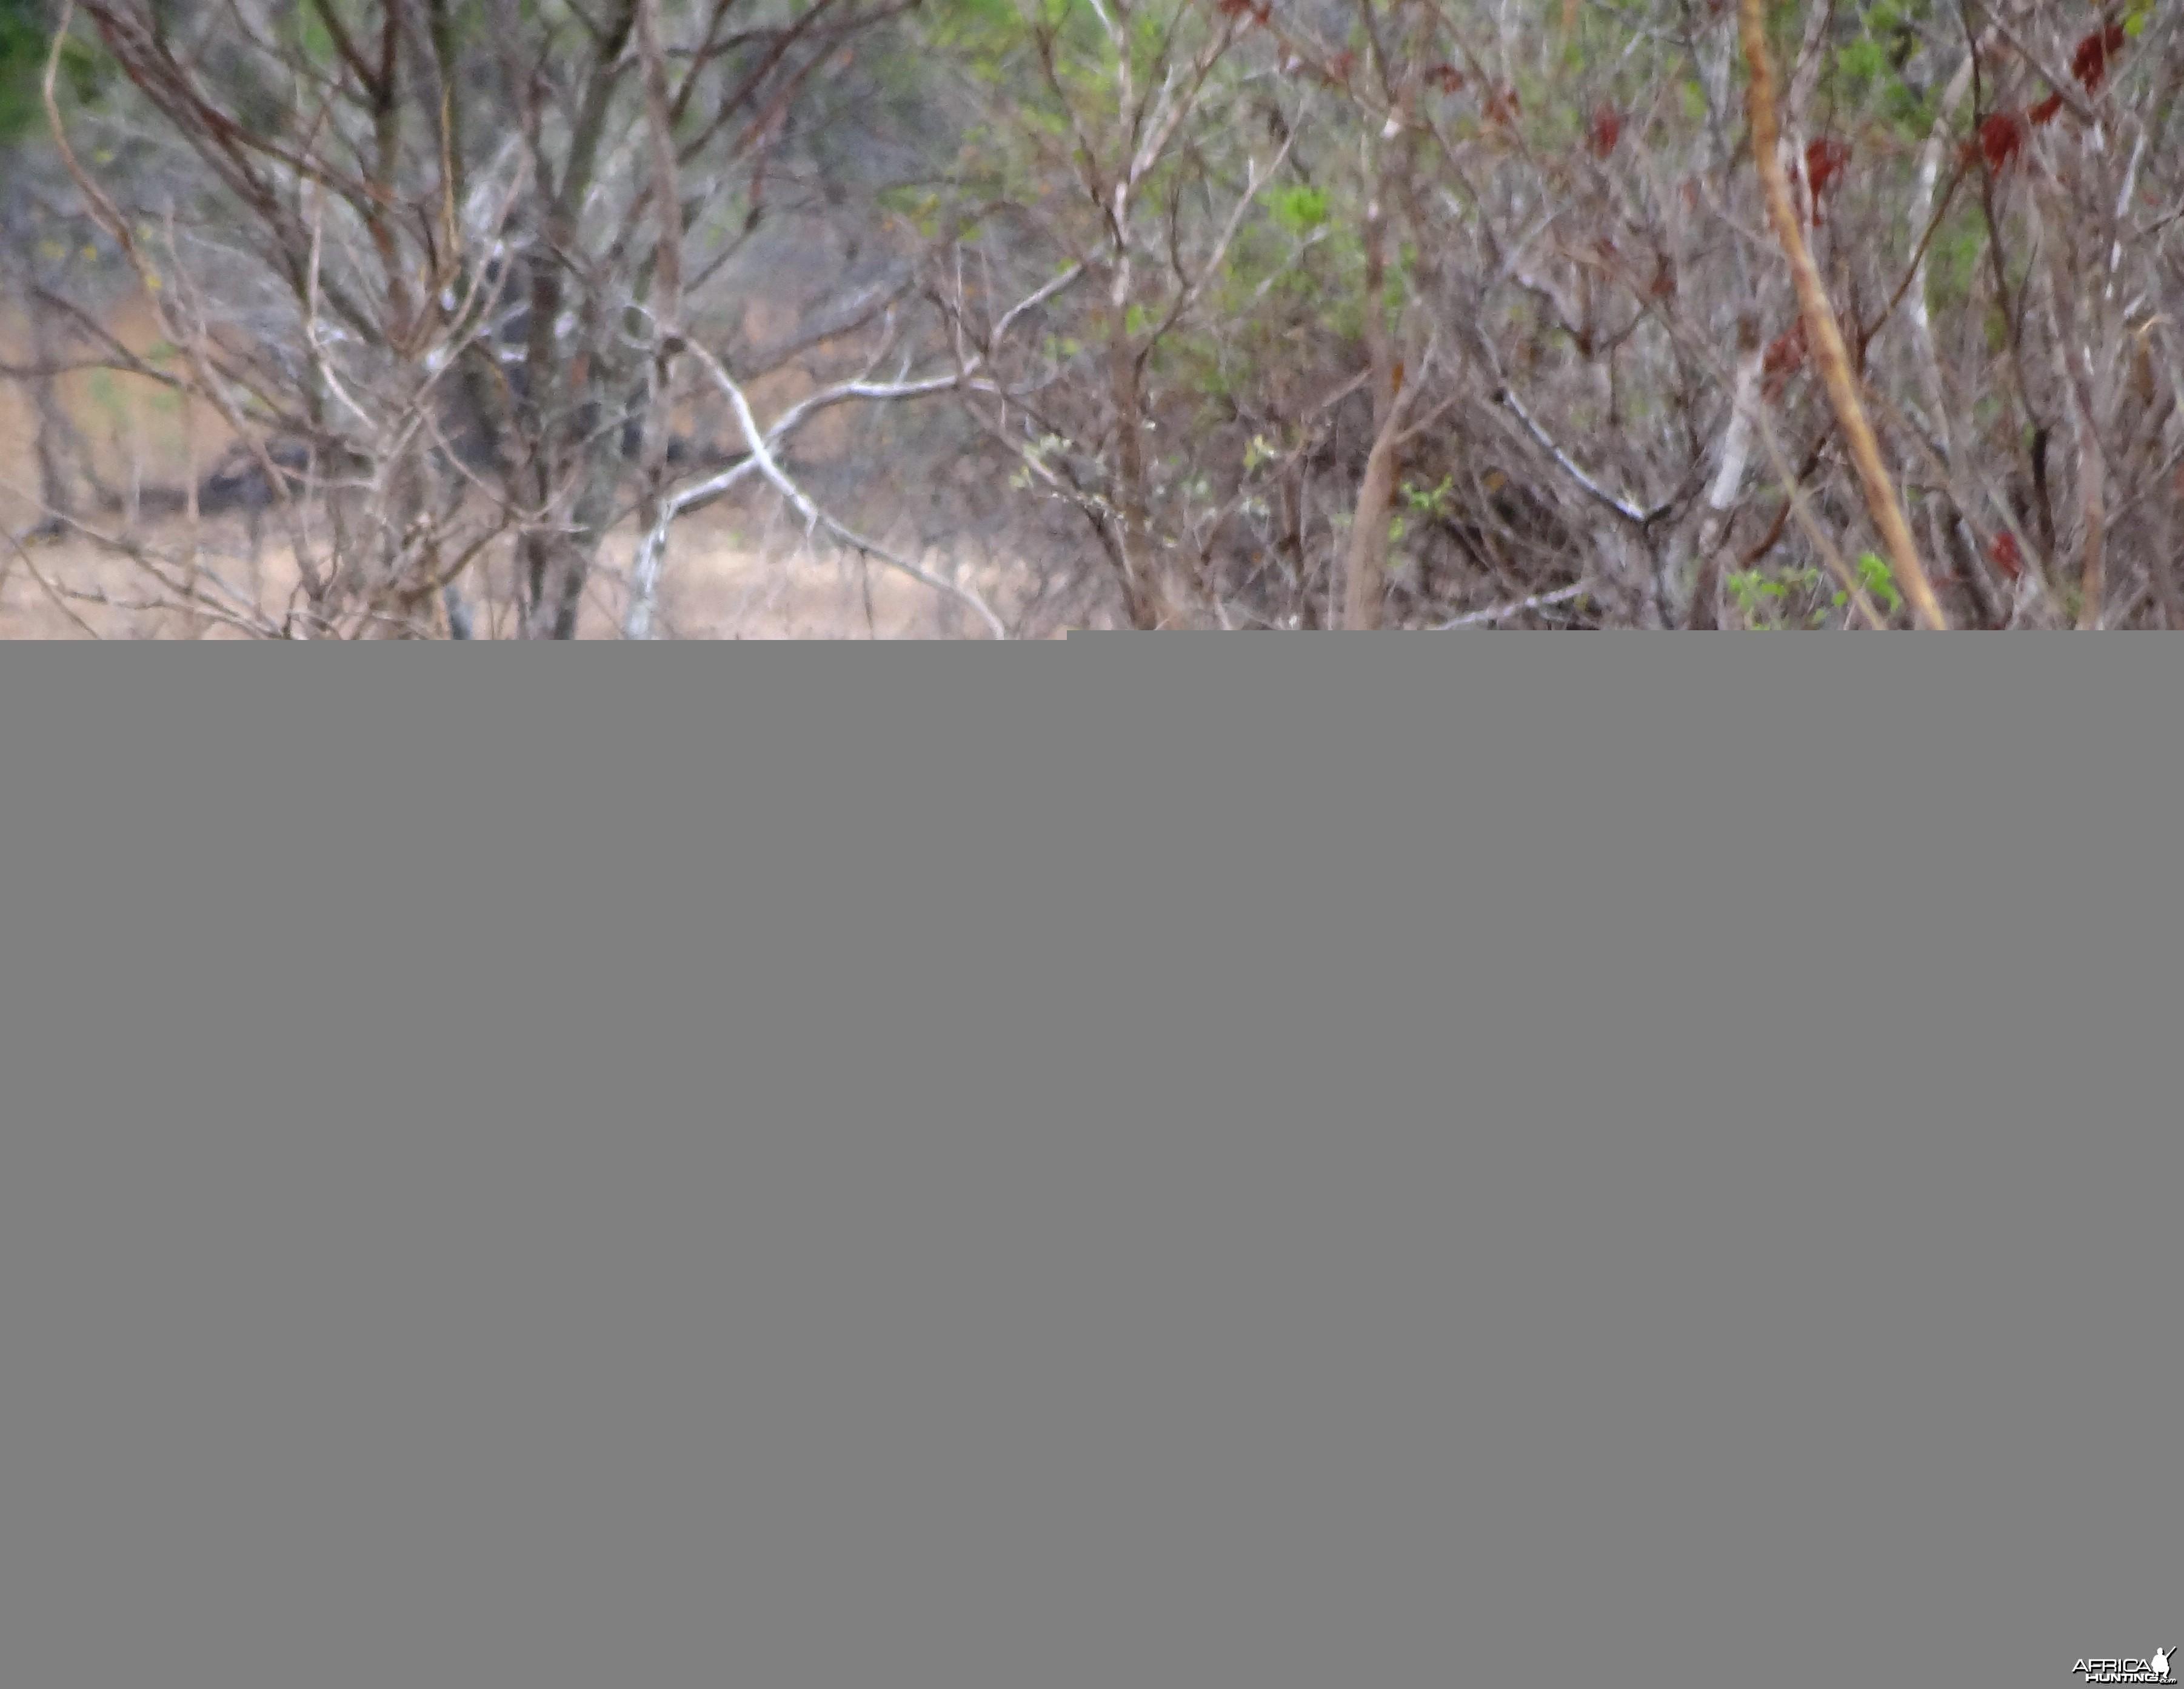 Warthog - Tanzania